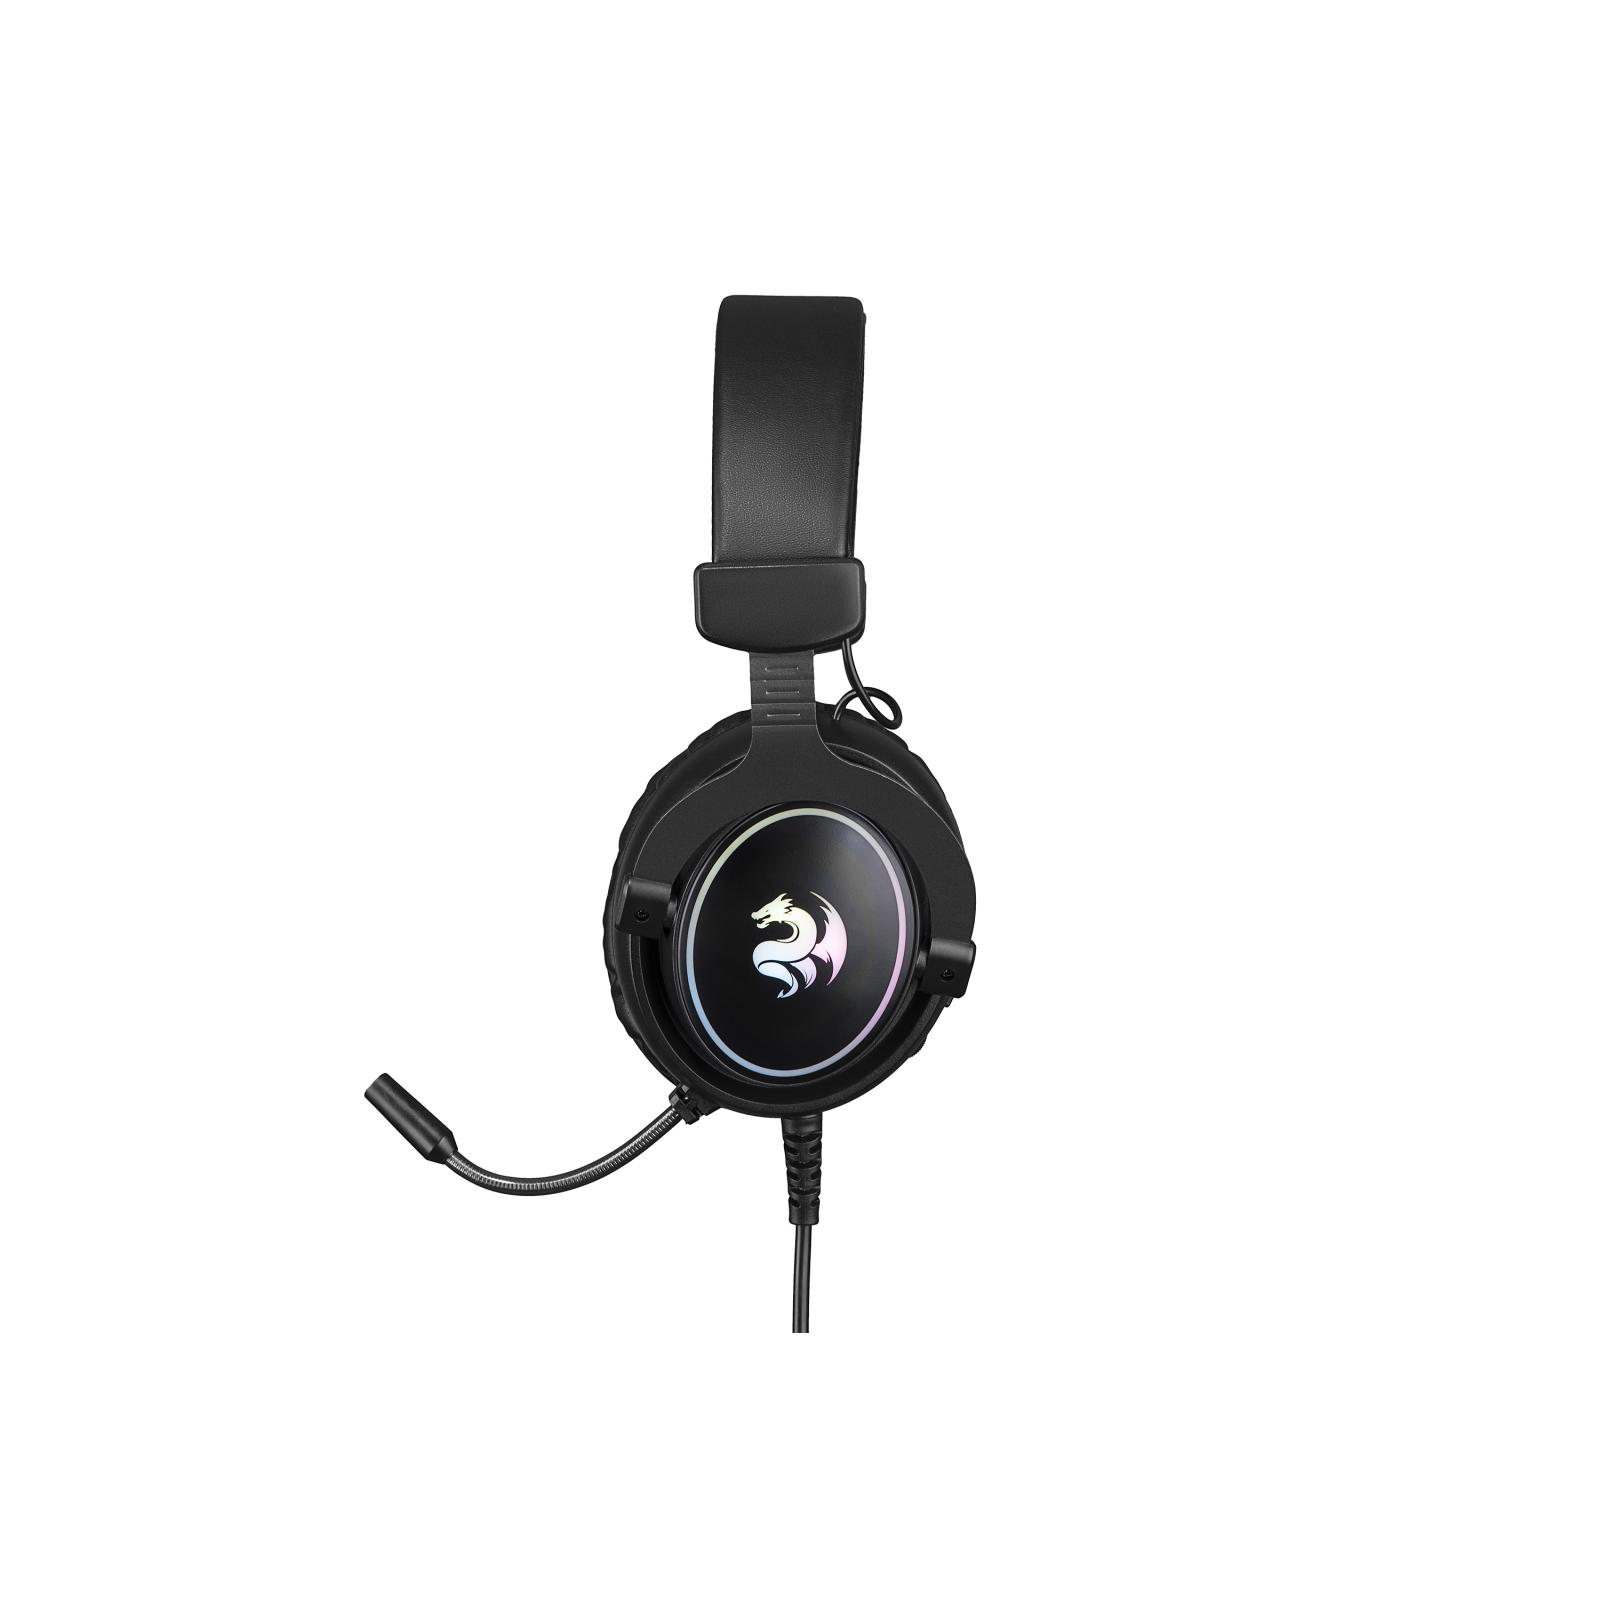 Навушники 2E Gaming HG320 LED Black (2E-HG320B) зображення 2